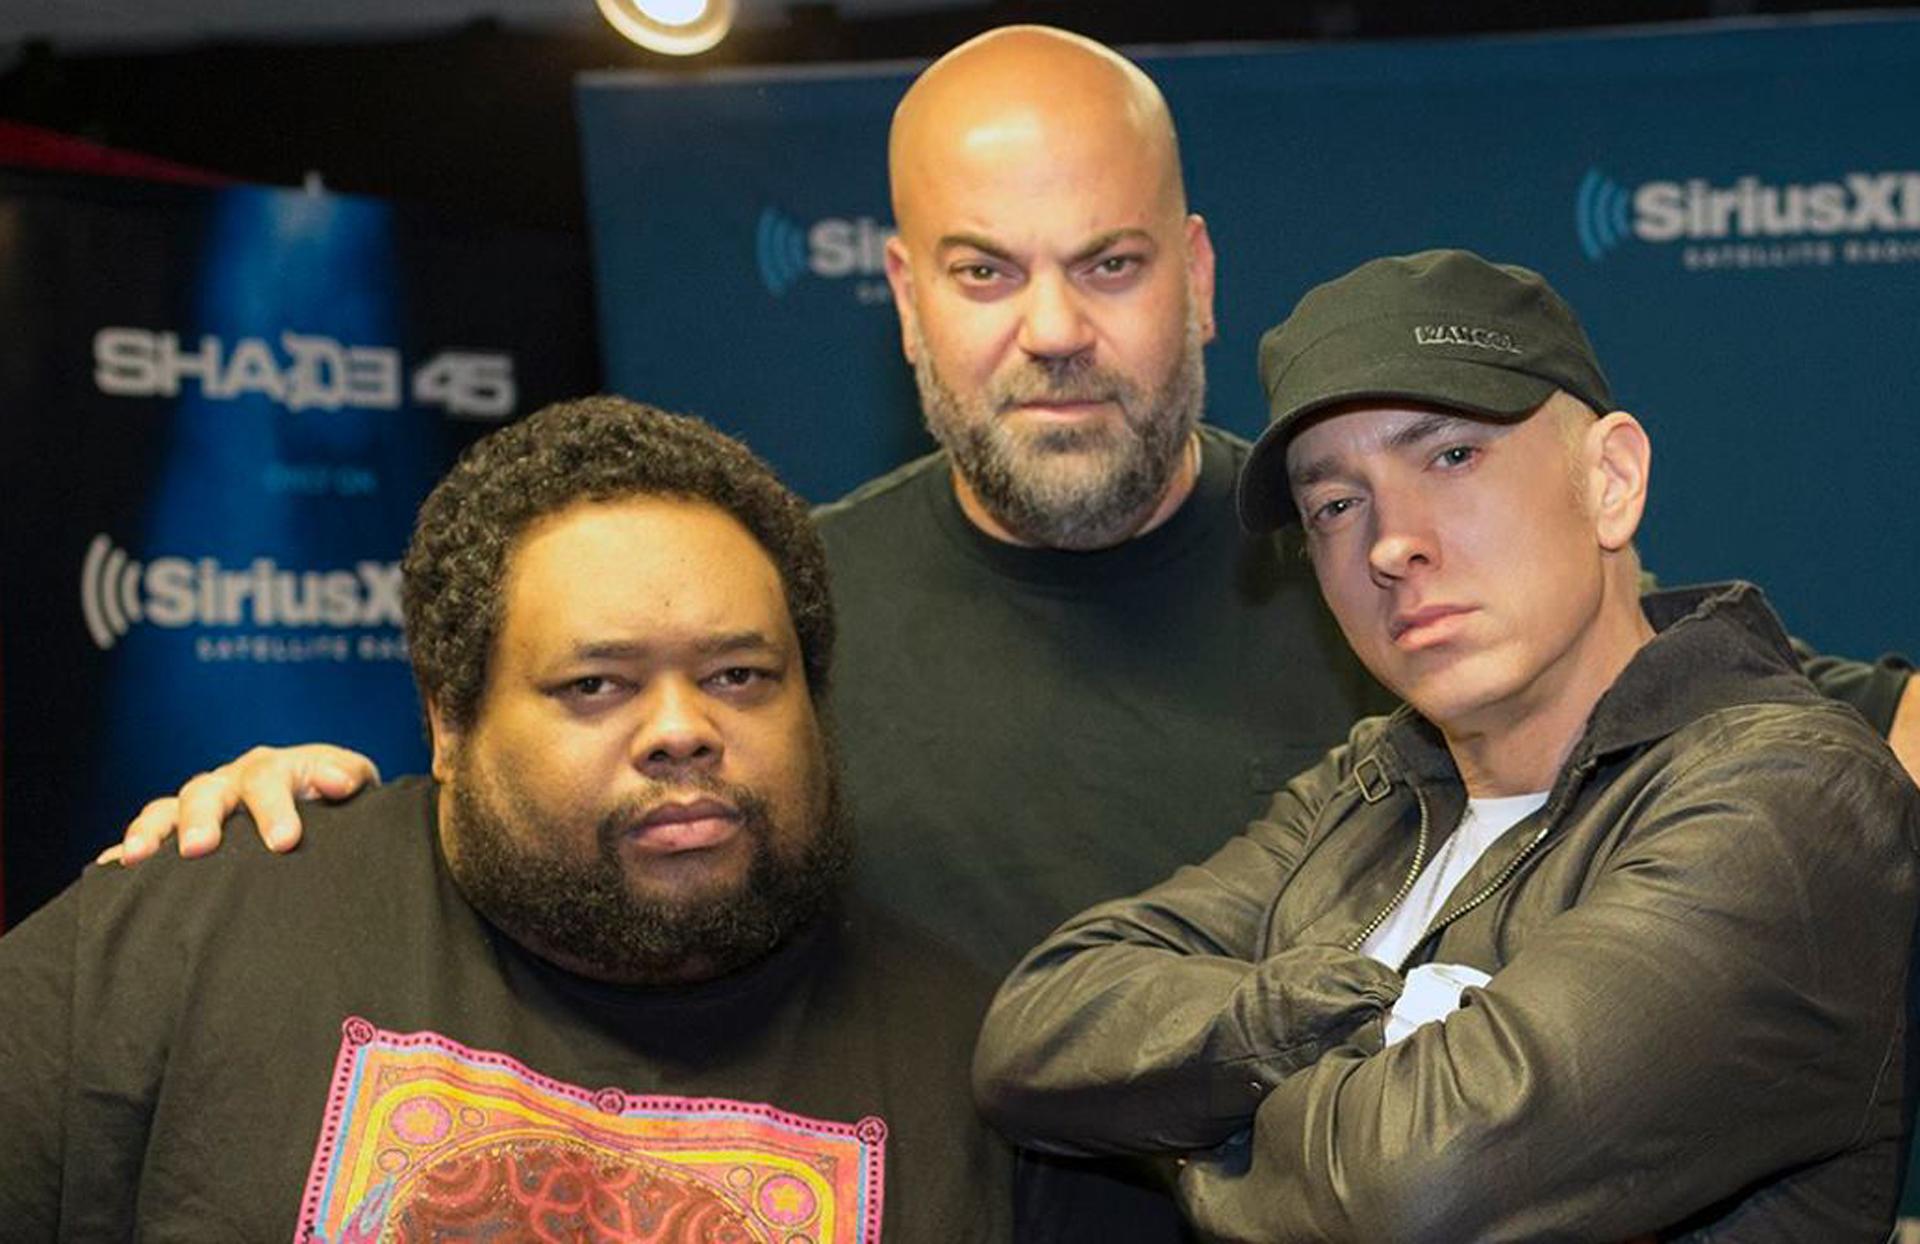 Eminem, Paul Rosenberg, Rude Jude & Lord Sear, Shade 45 2016